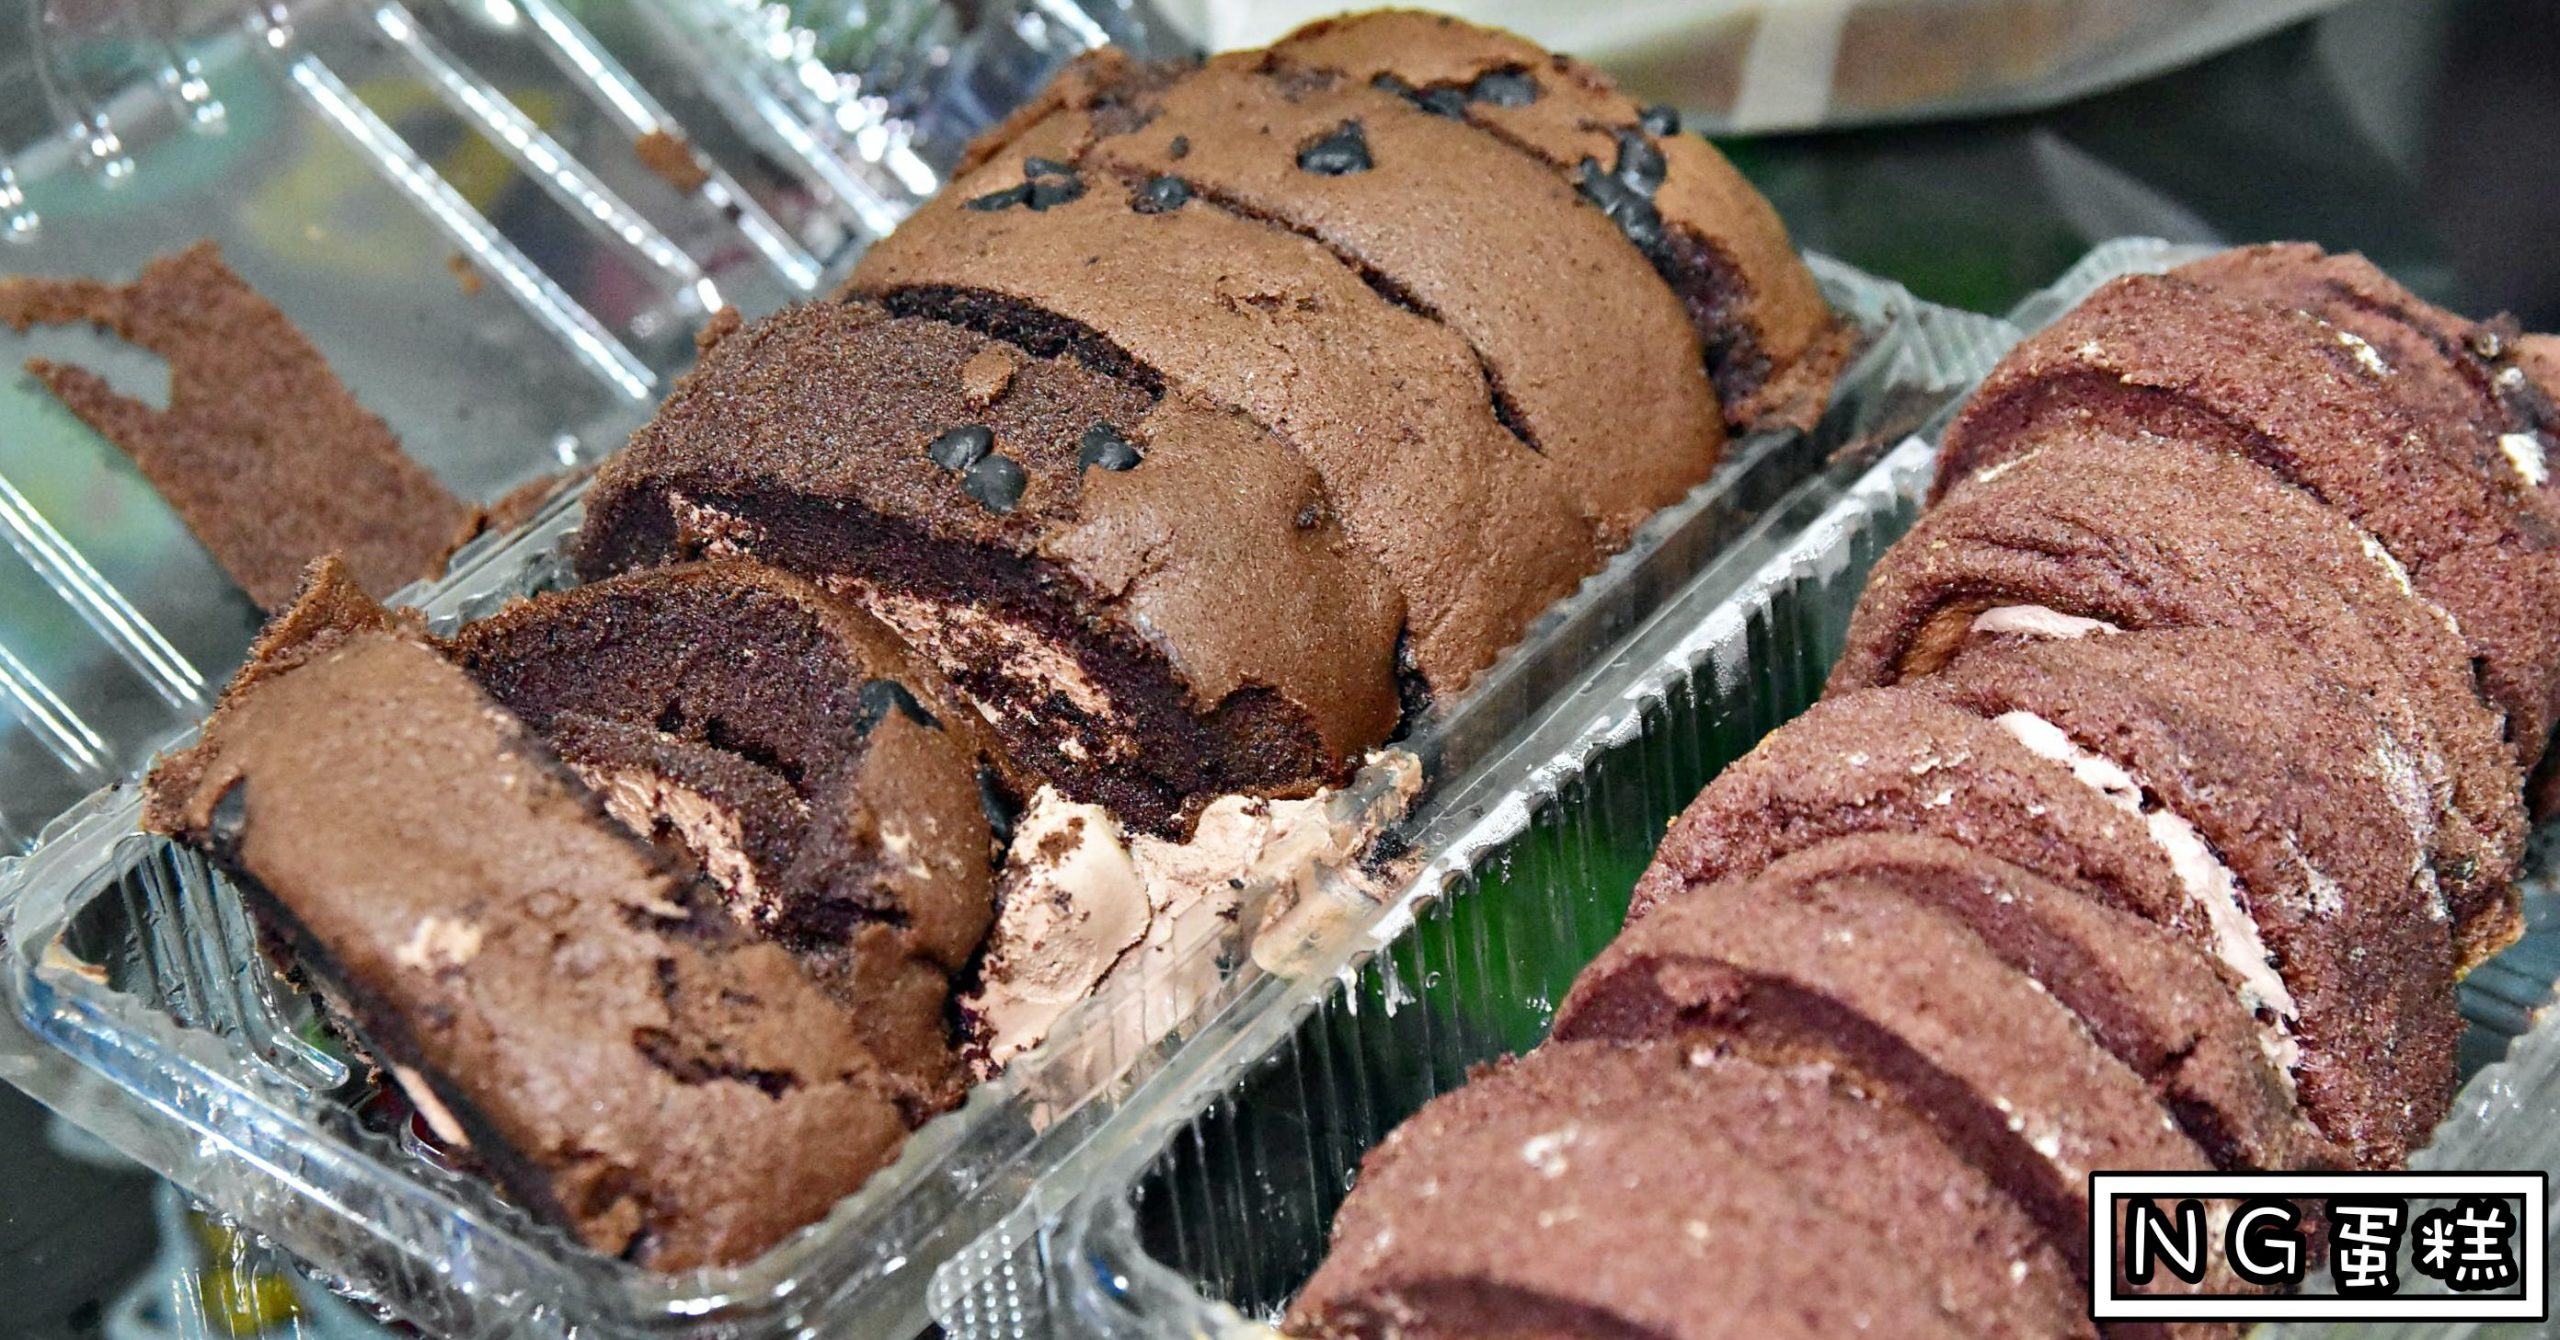 三重NG蛋糕,NG蛋糕 @Nash,神之領域